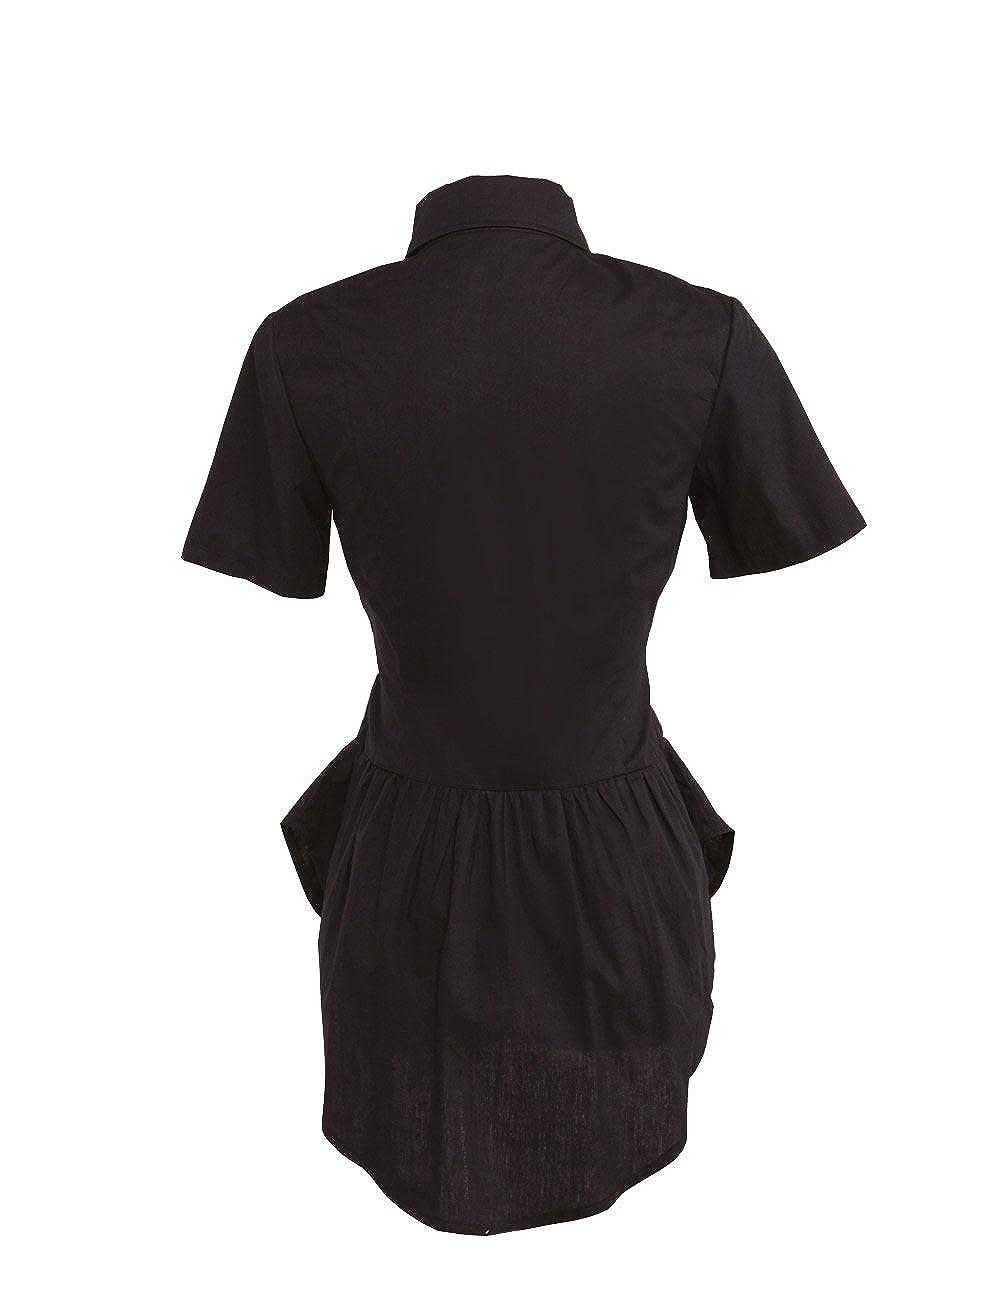 78a66941294660 Amazon.com: Antaina Black Cotton Ruffle Lace Retro Gothic Punk Lolita Shirt  Blouse: Clothing